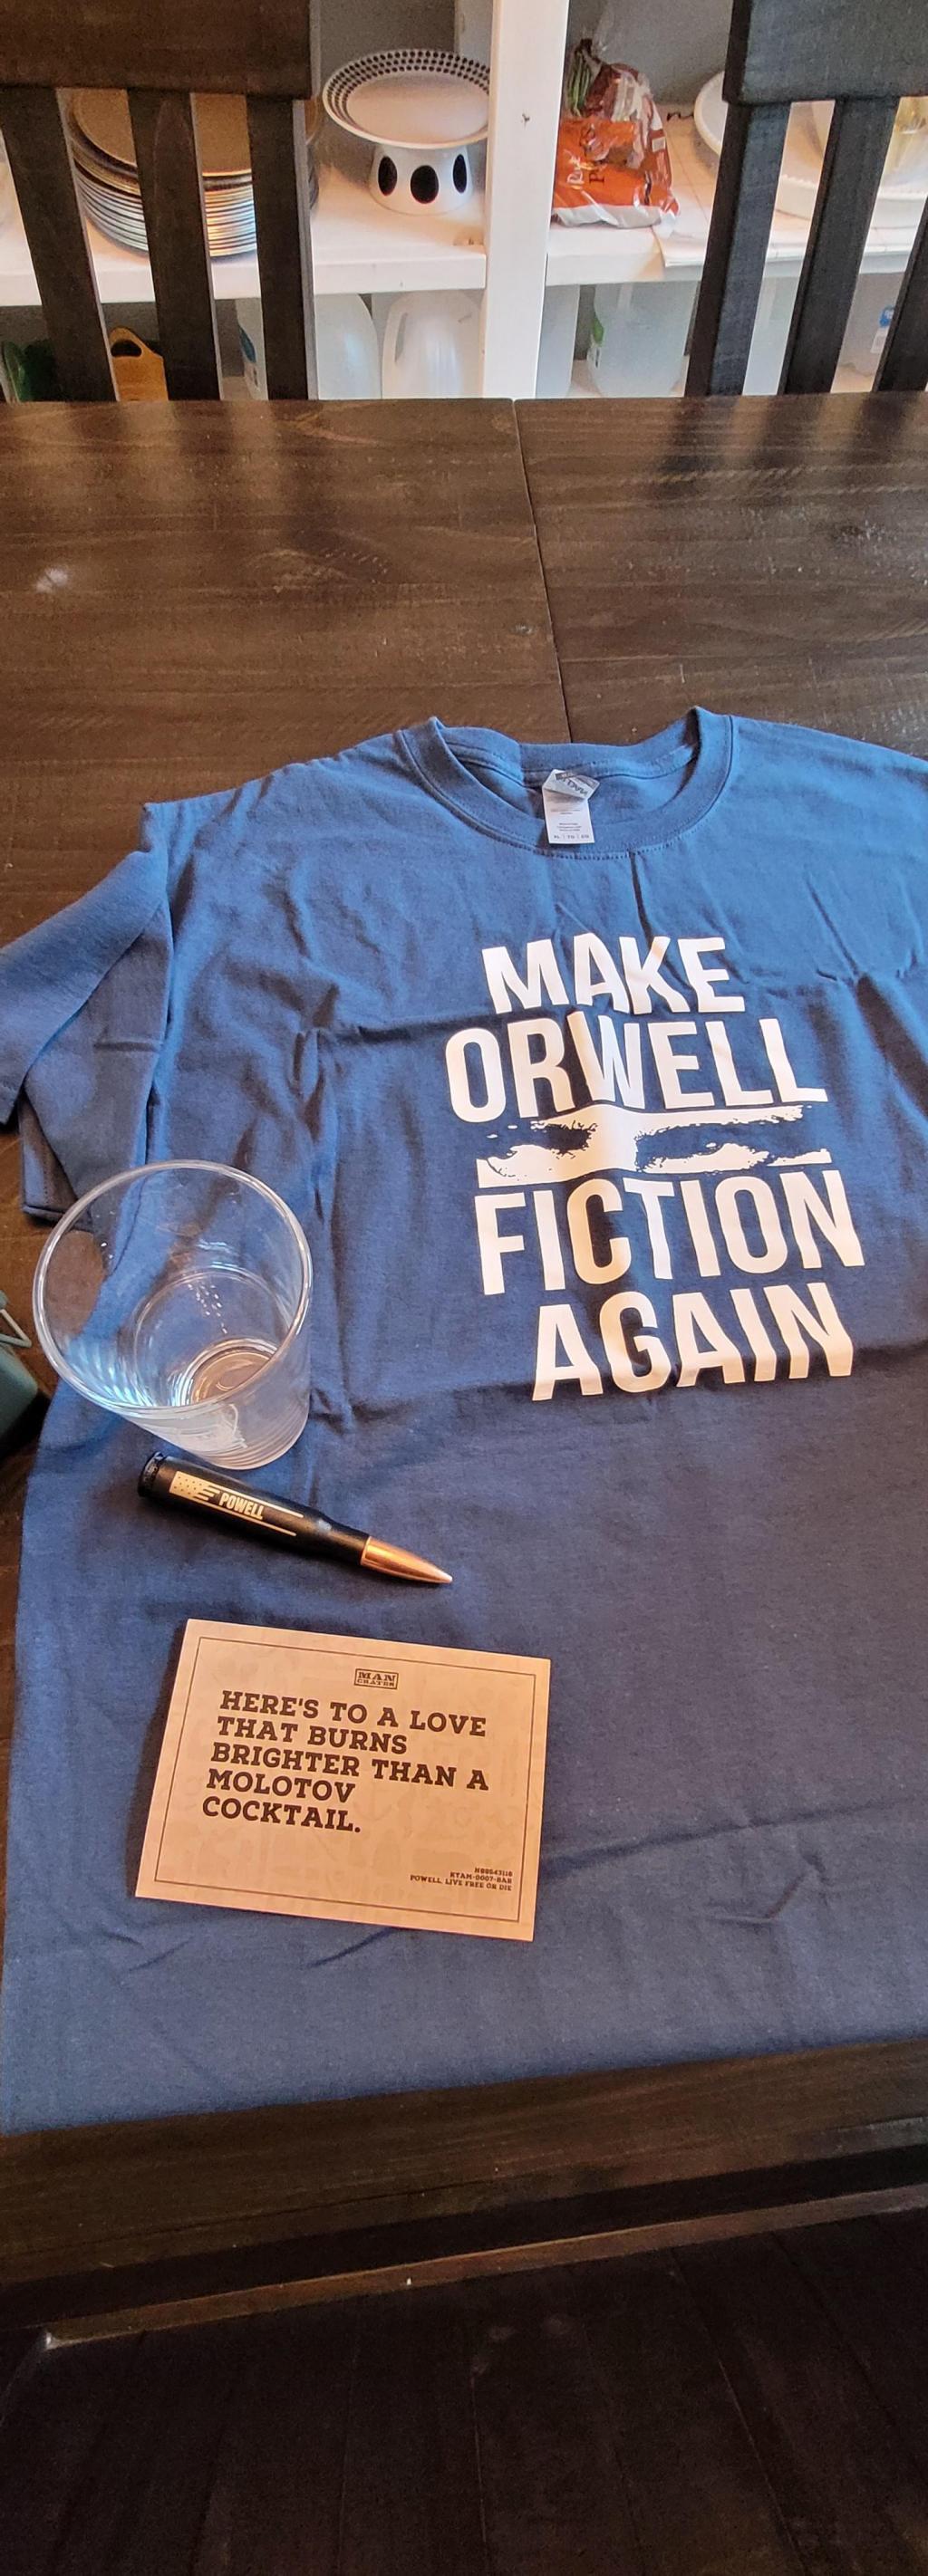 Make Orwell Fiction Again